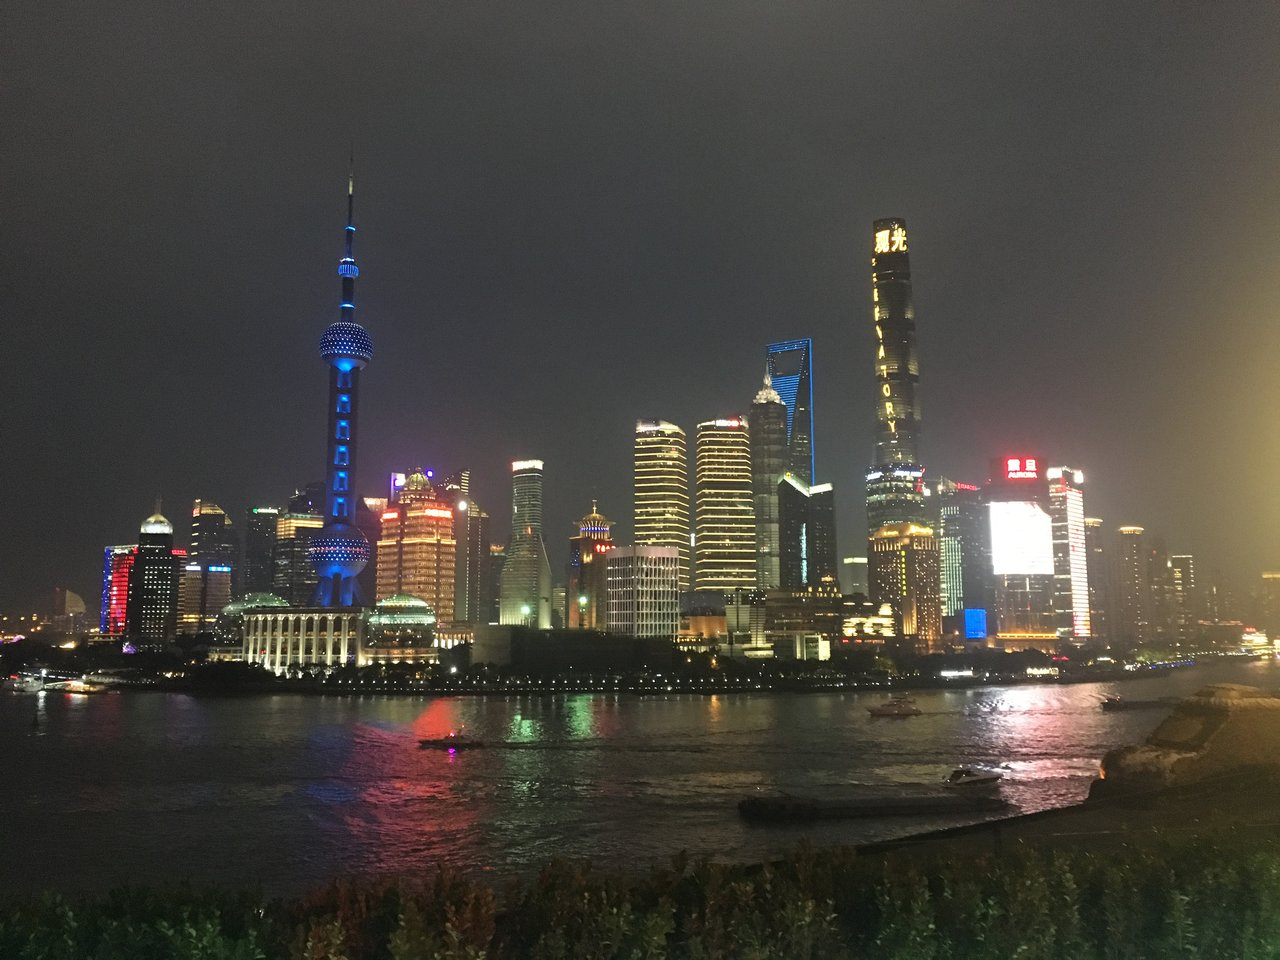 Shanghai is China's financial hub | Photo taken by Gary C